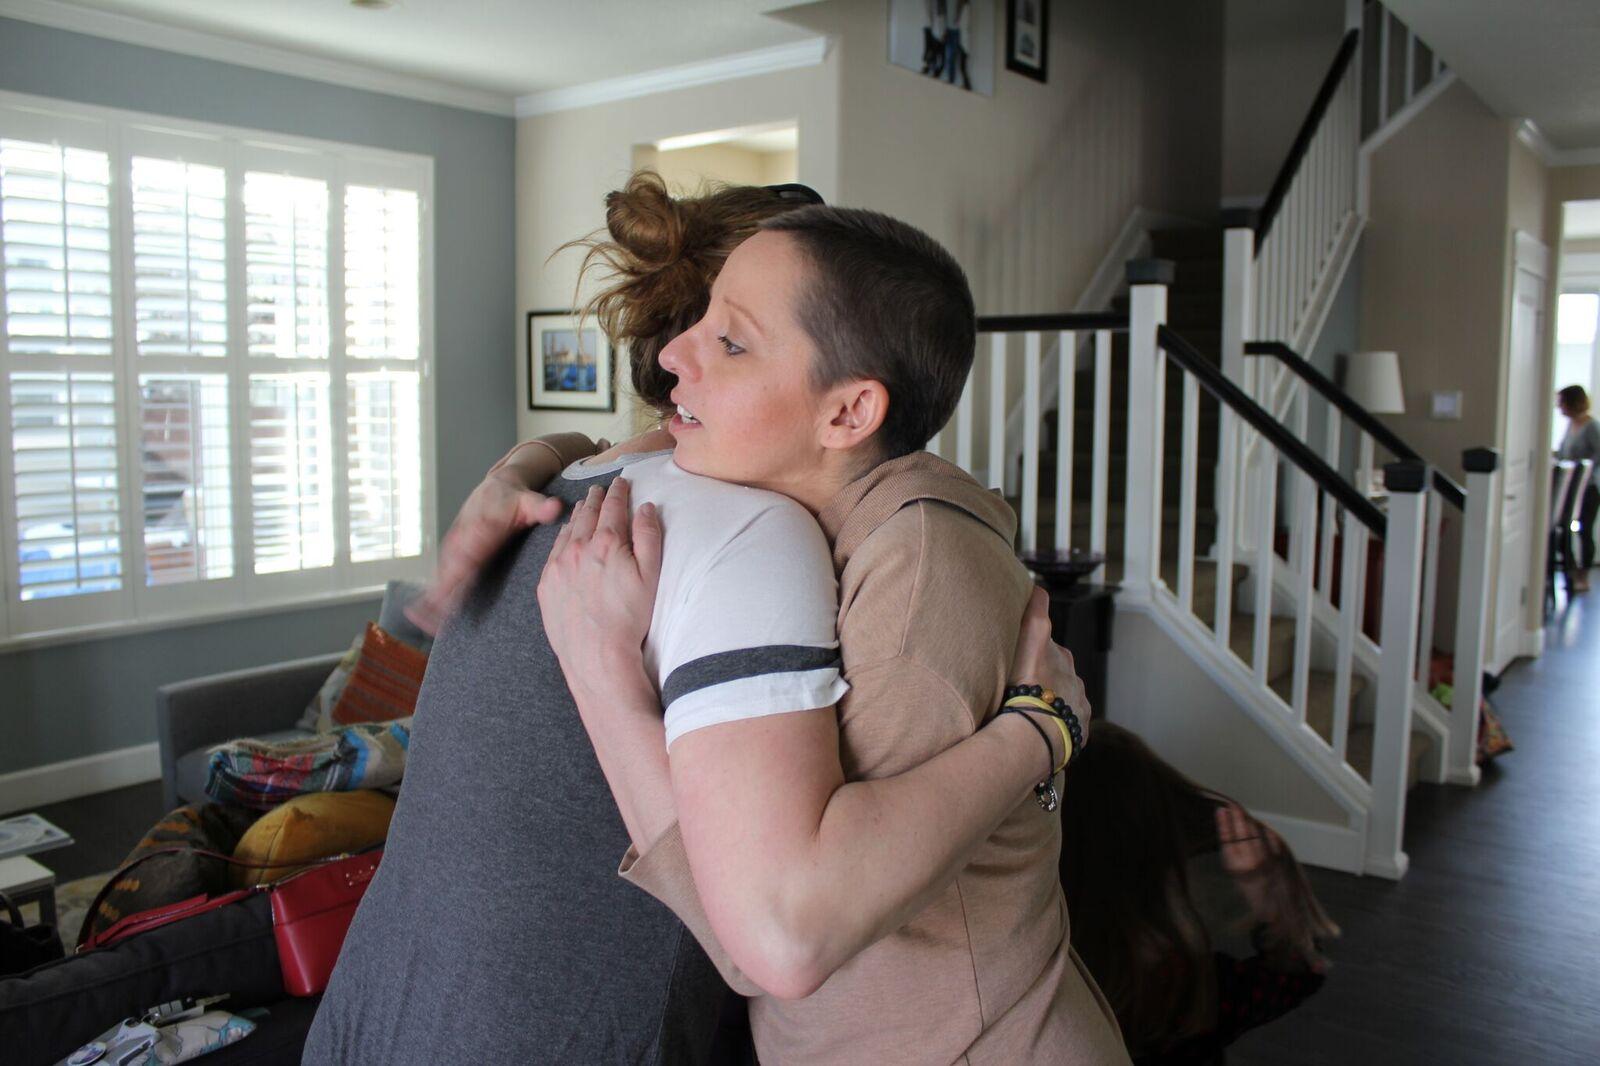 Embrace_BeadingBrunch, Malas for Tatas, Colorado Non-profit